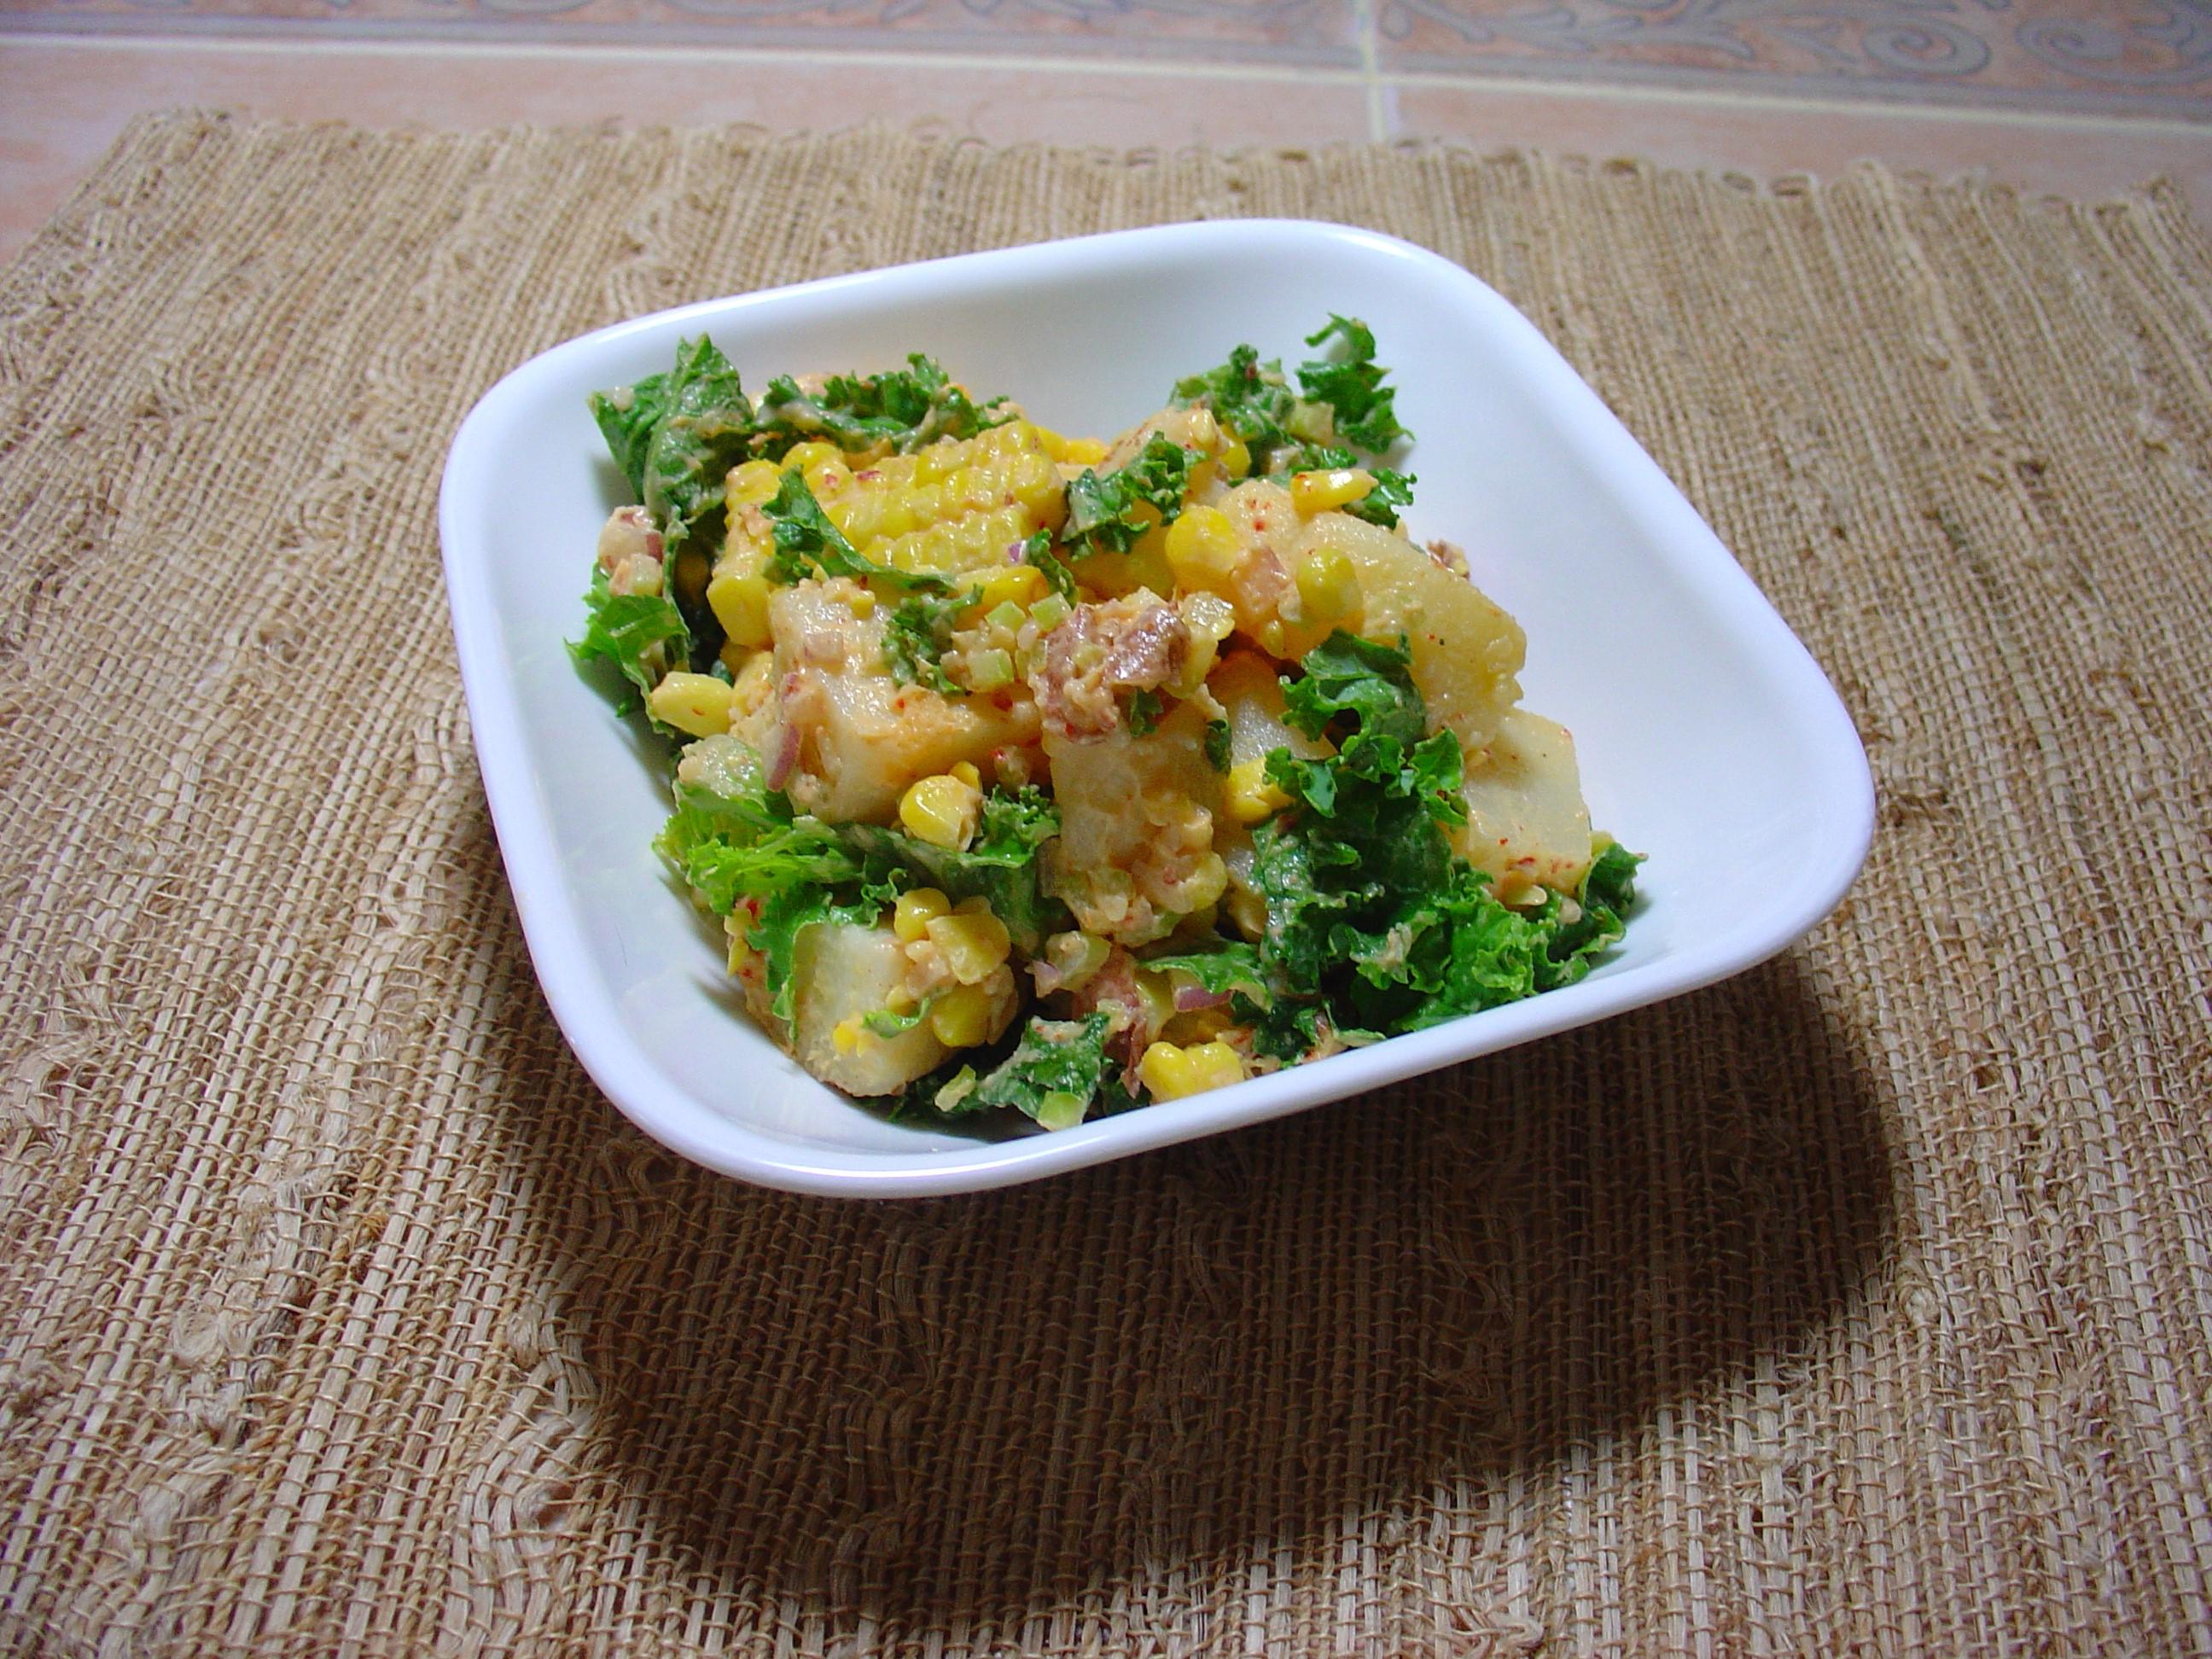 Moroccan Potato Salad with harissa paste